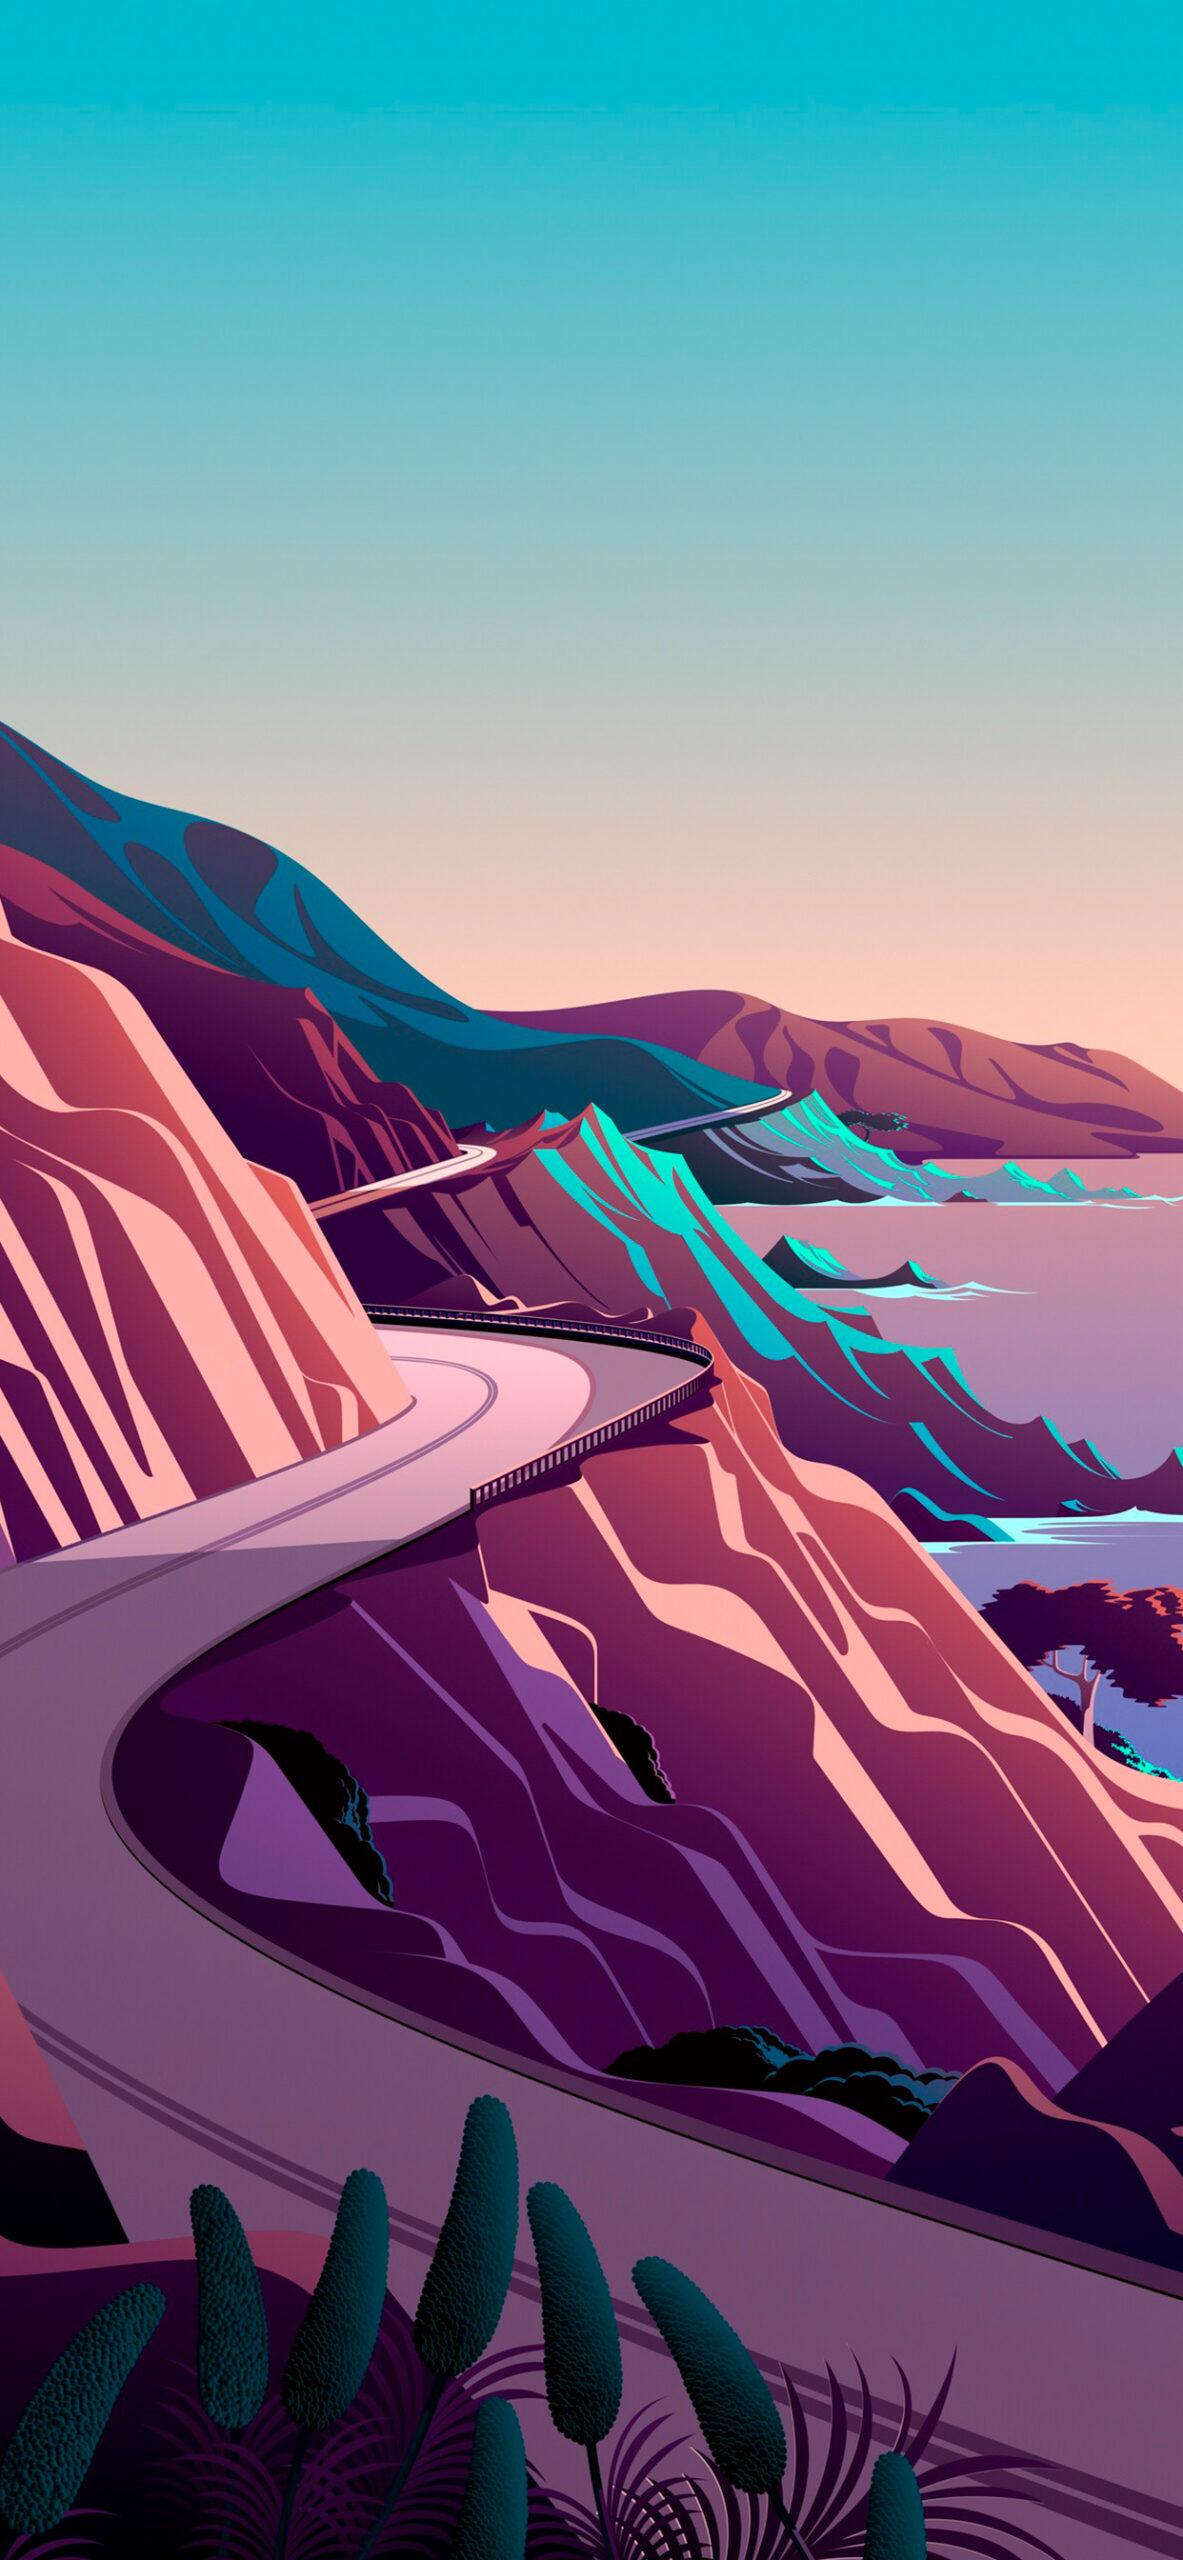 iphone wallpaper big sur cliffs4 scaled Mac OS Big Sur (Cliffs)